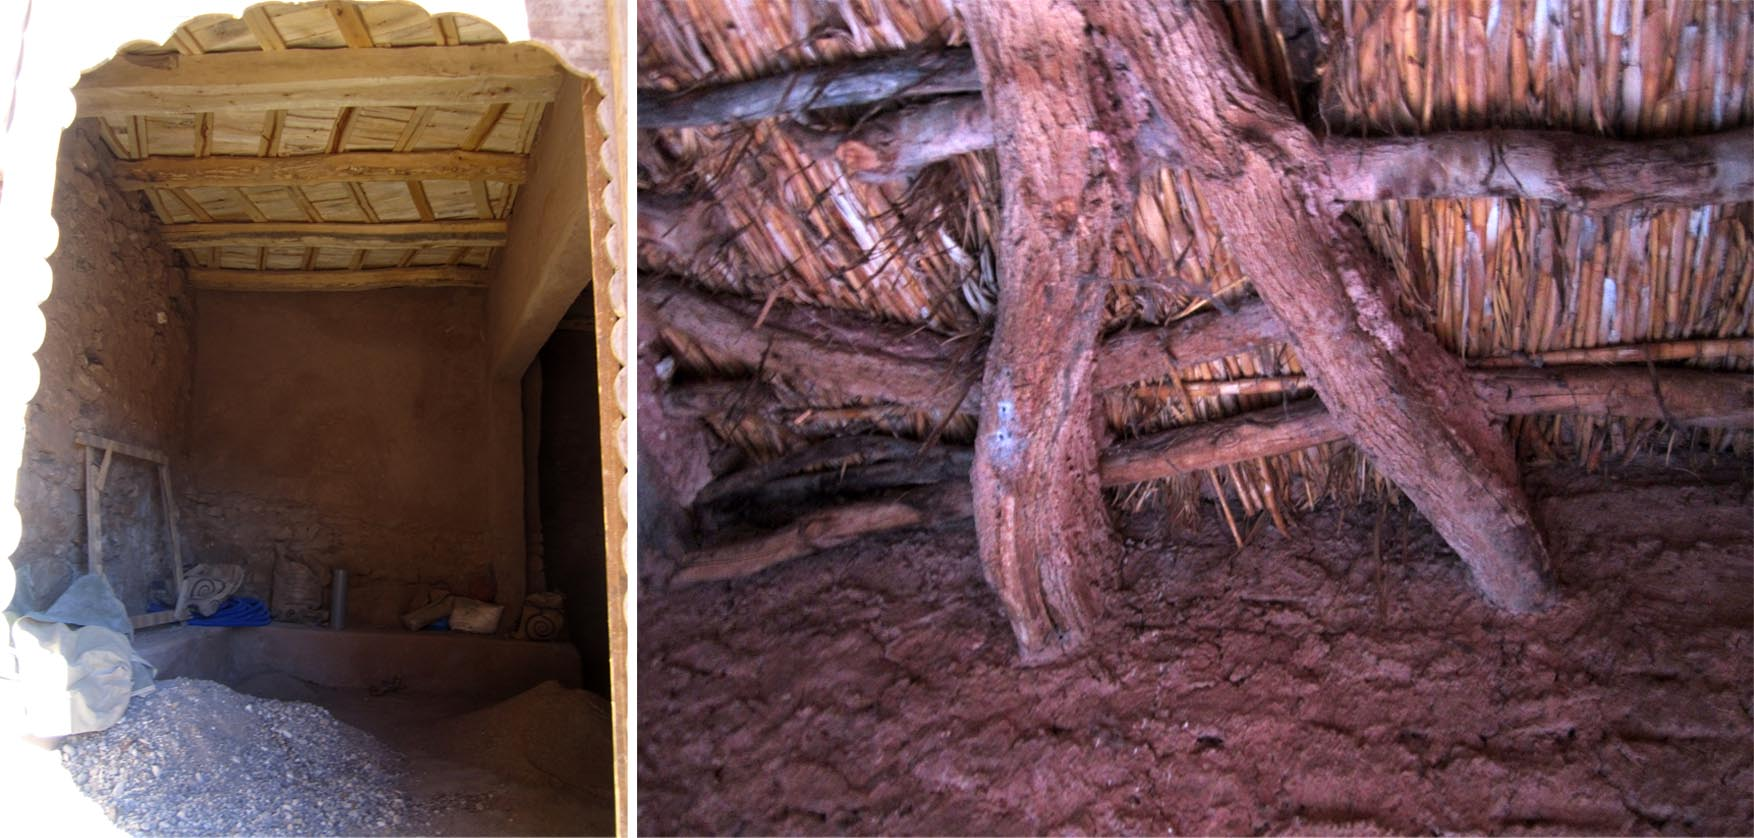 15 maroko ait ben haddou ravni krovovi